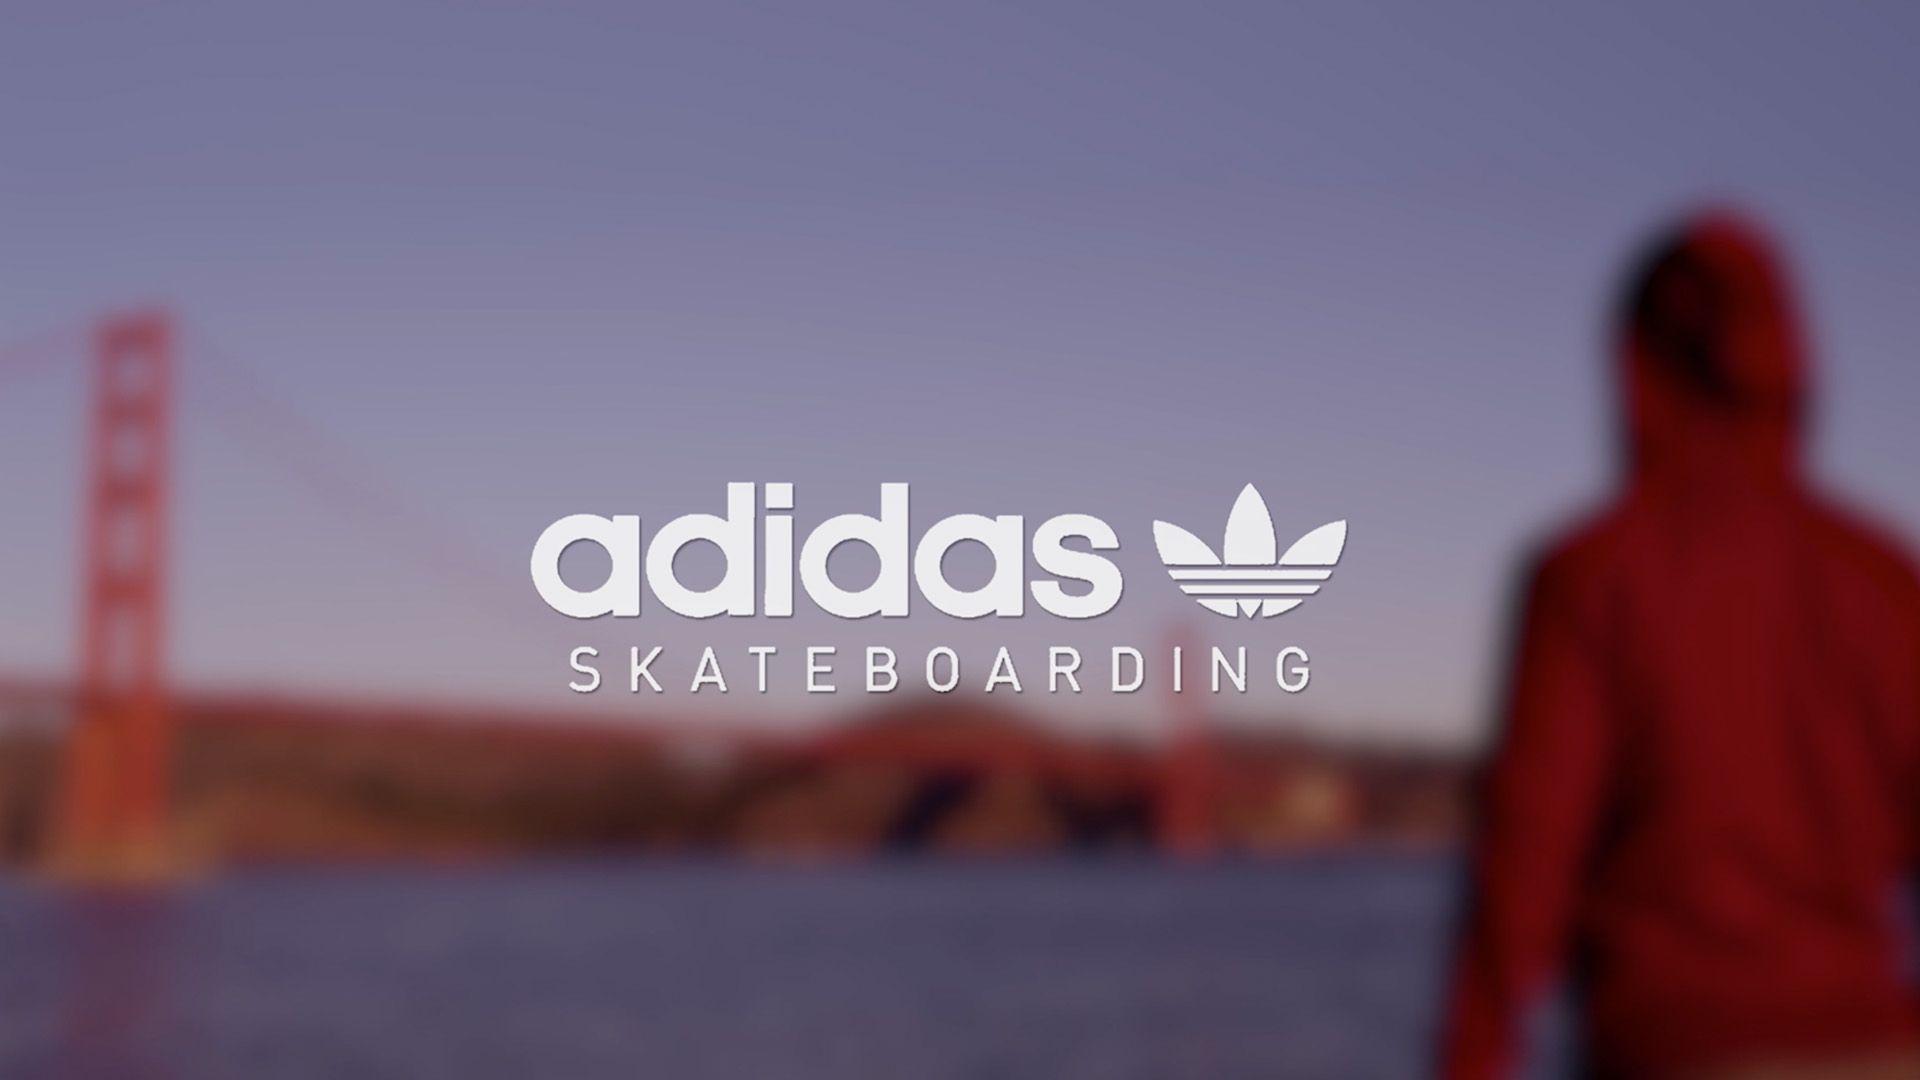 adidas campus vulc skateboarding wallpaper